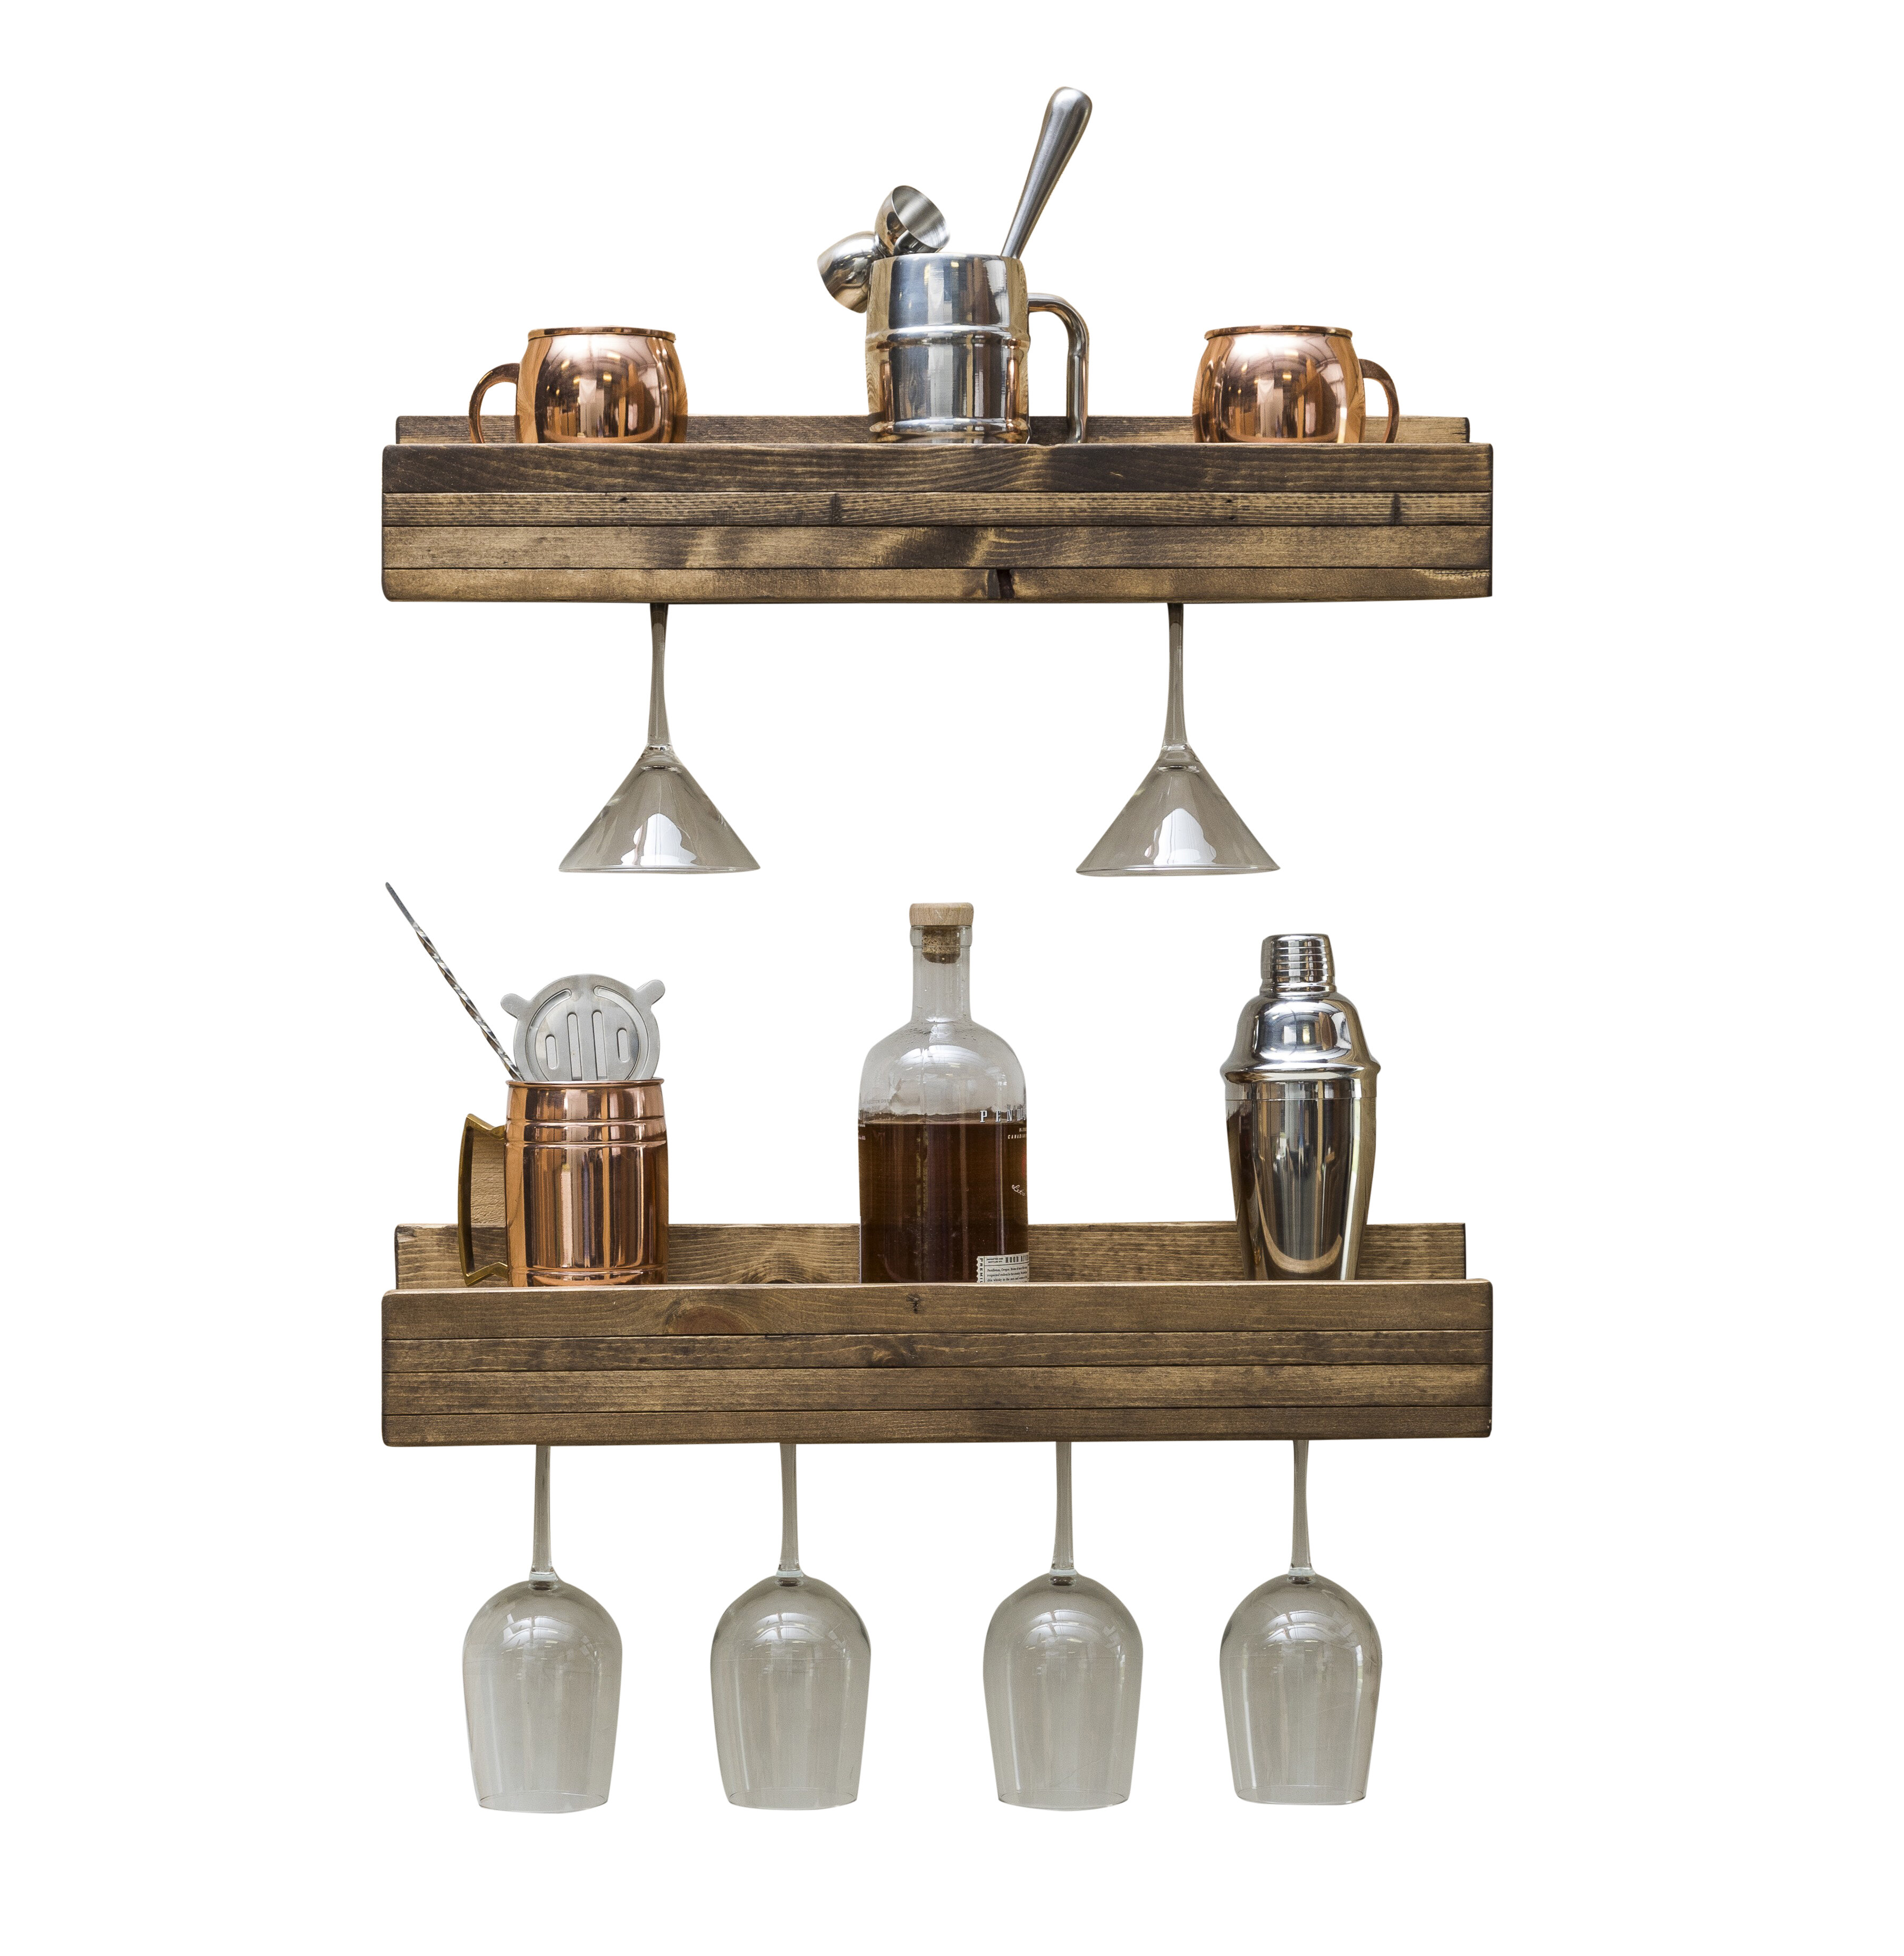 Gatton Wall Mounted Wine Glass Rack Reviews Allmodern